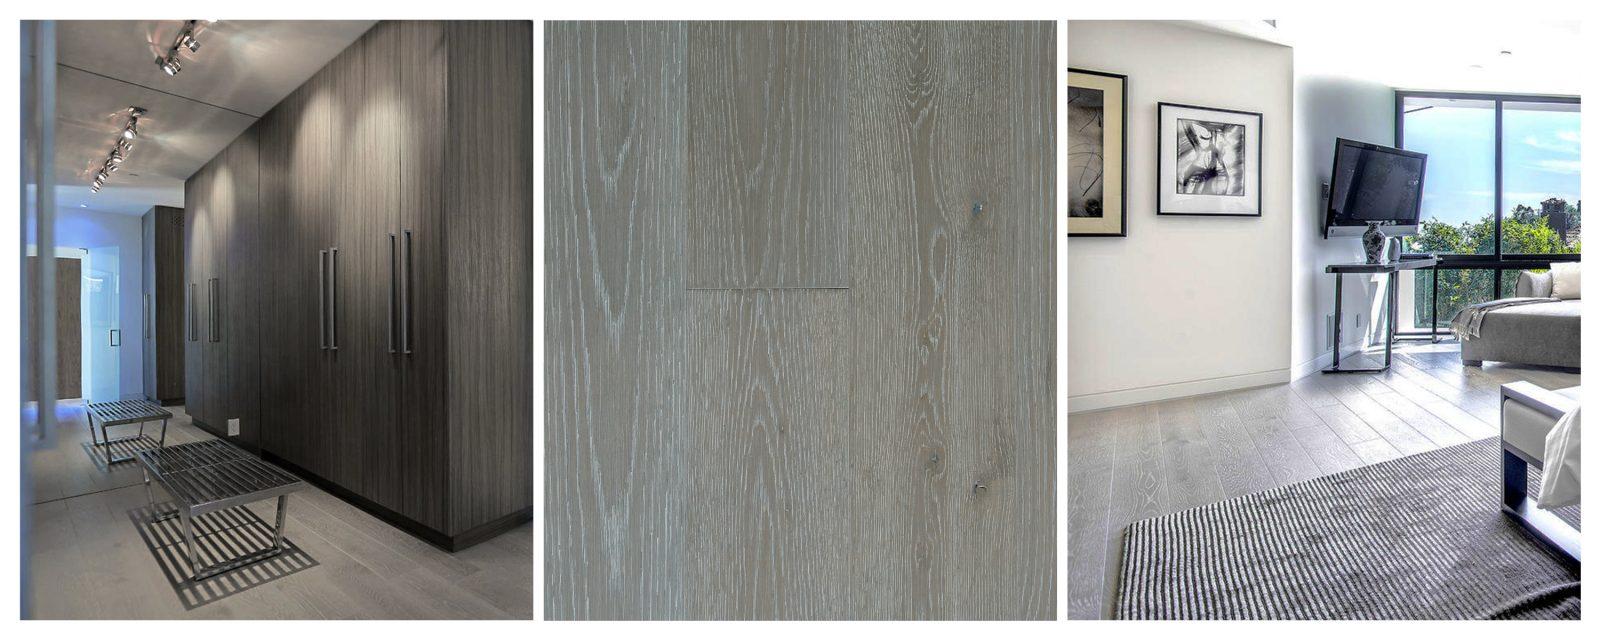 Hardwood Floor Trend - Grey Hardwood Flooring